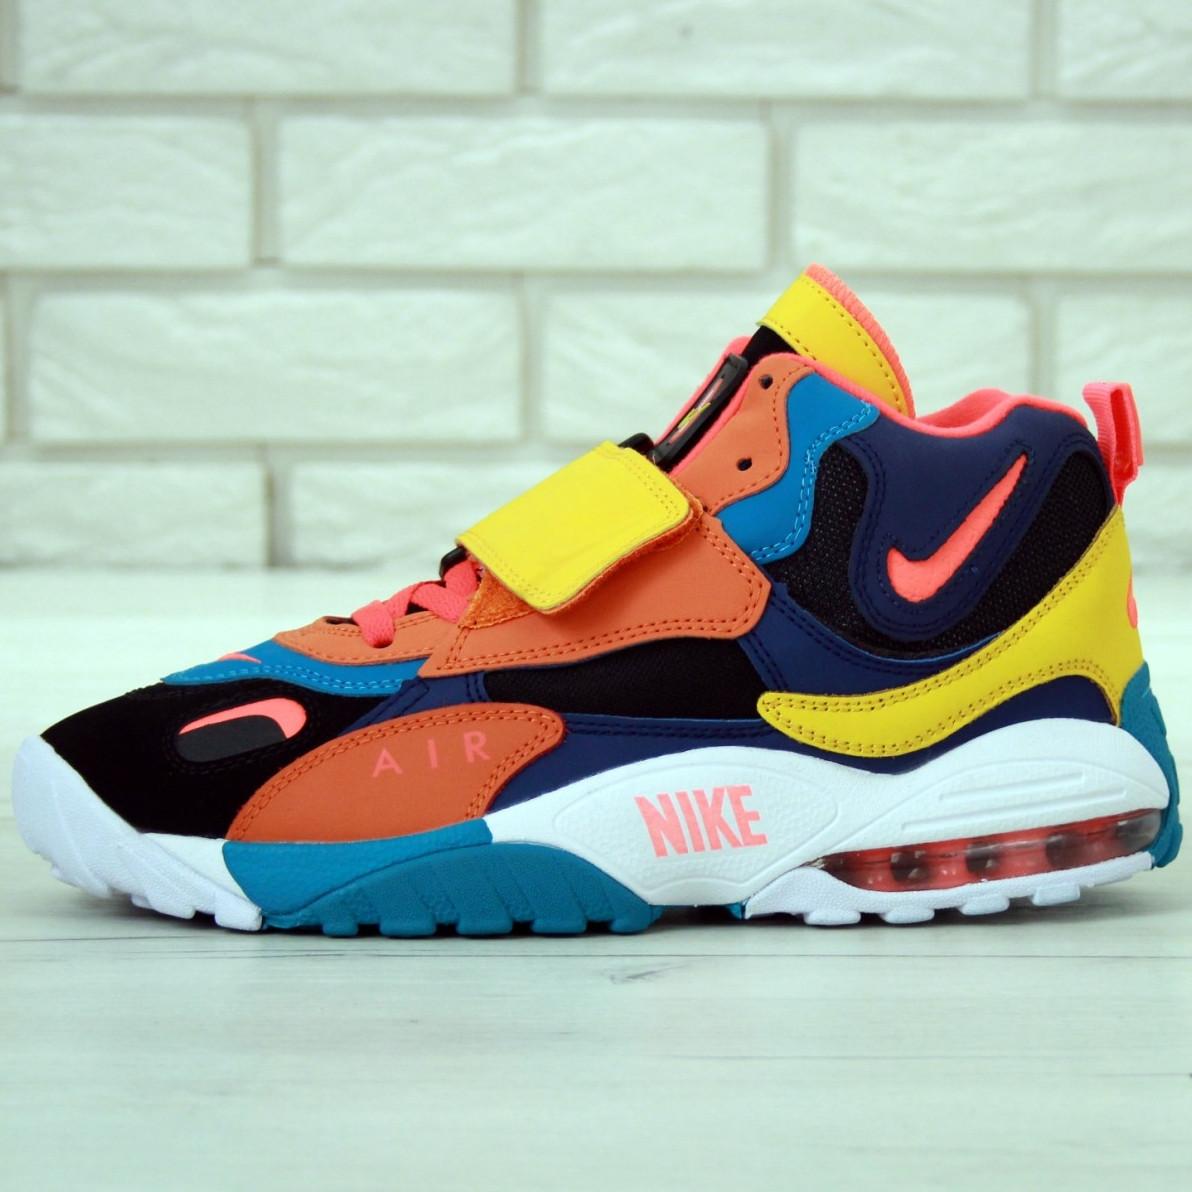 Кроссовки мужские Nike Air Max Speed Turf оранжевые-синие (Top replic)